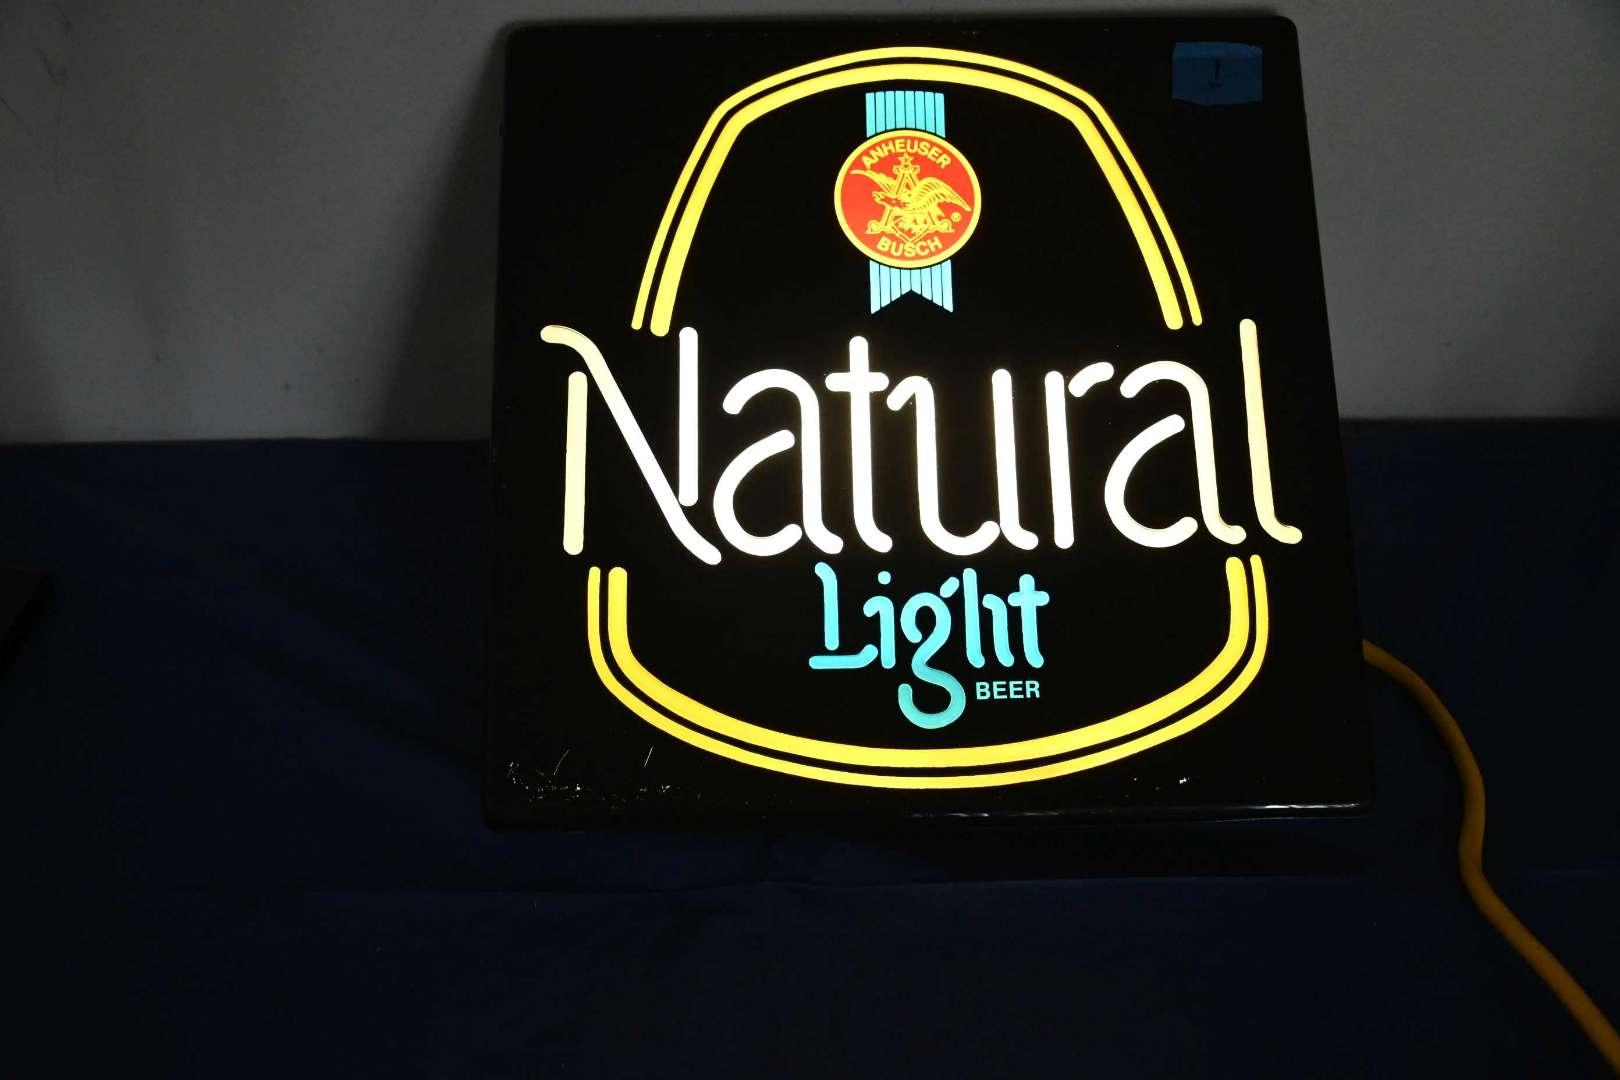 Lot # 1 NATURAL LIGHT lighted beer sign